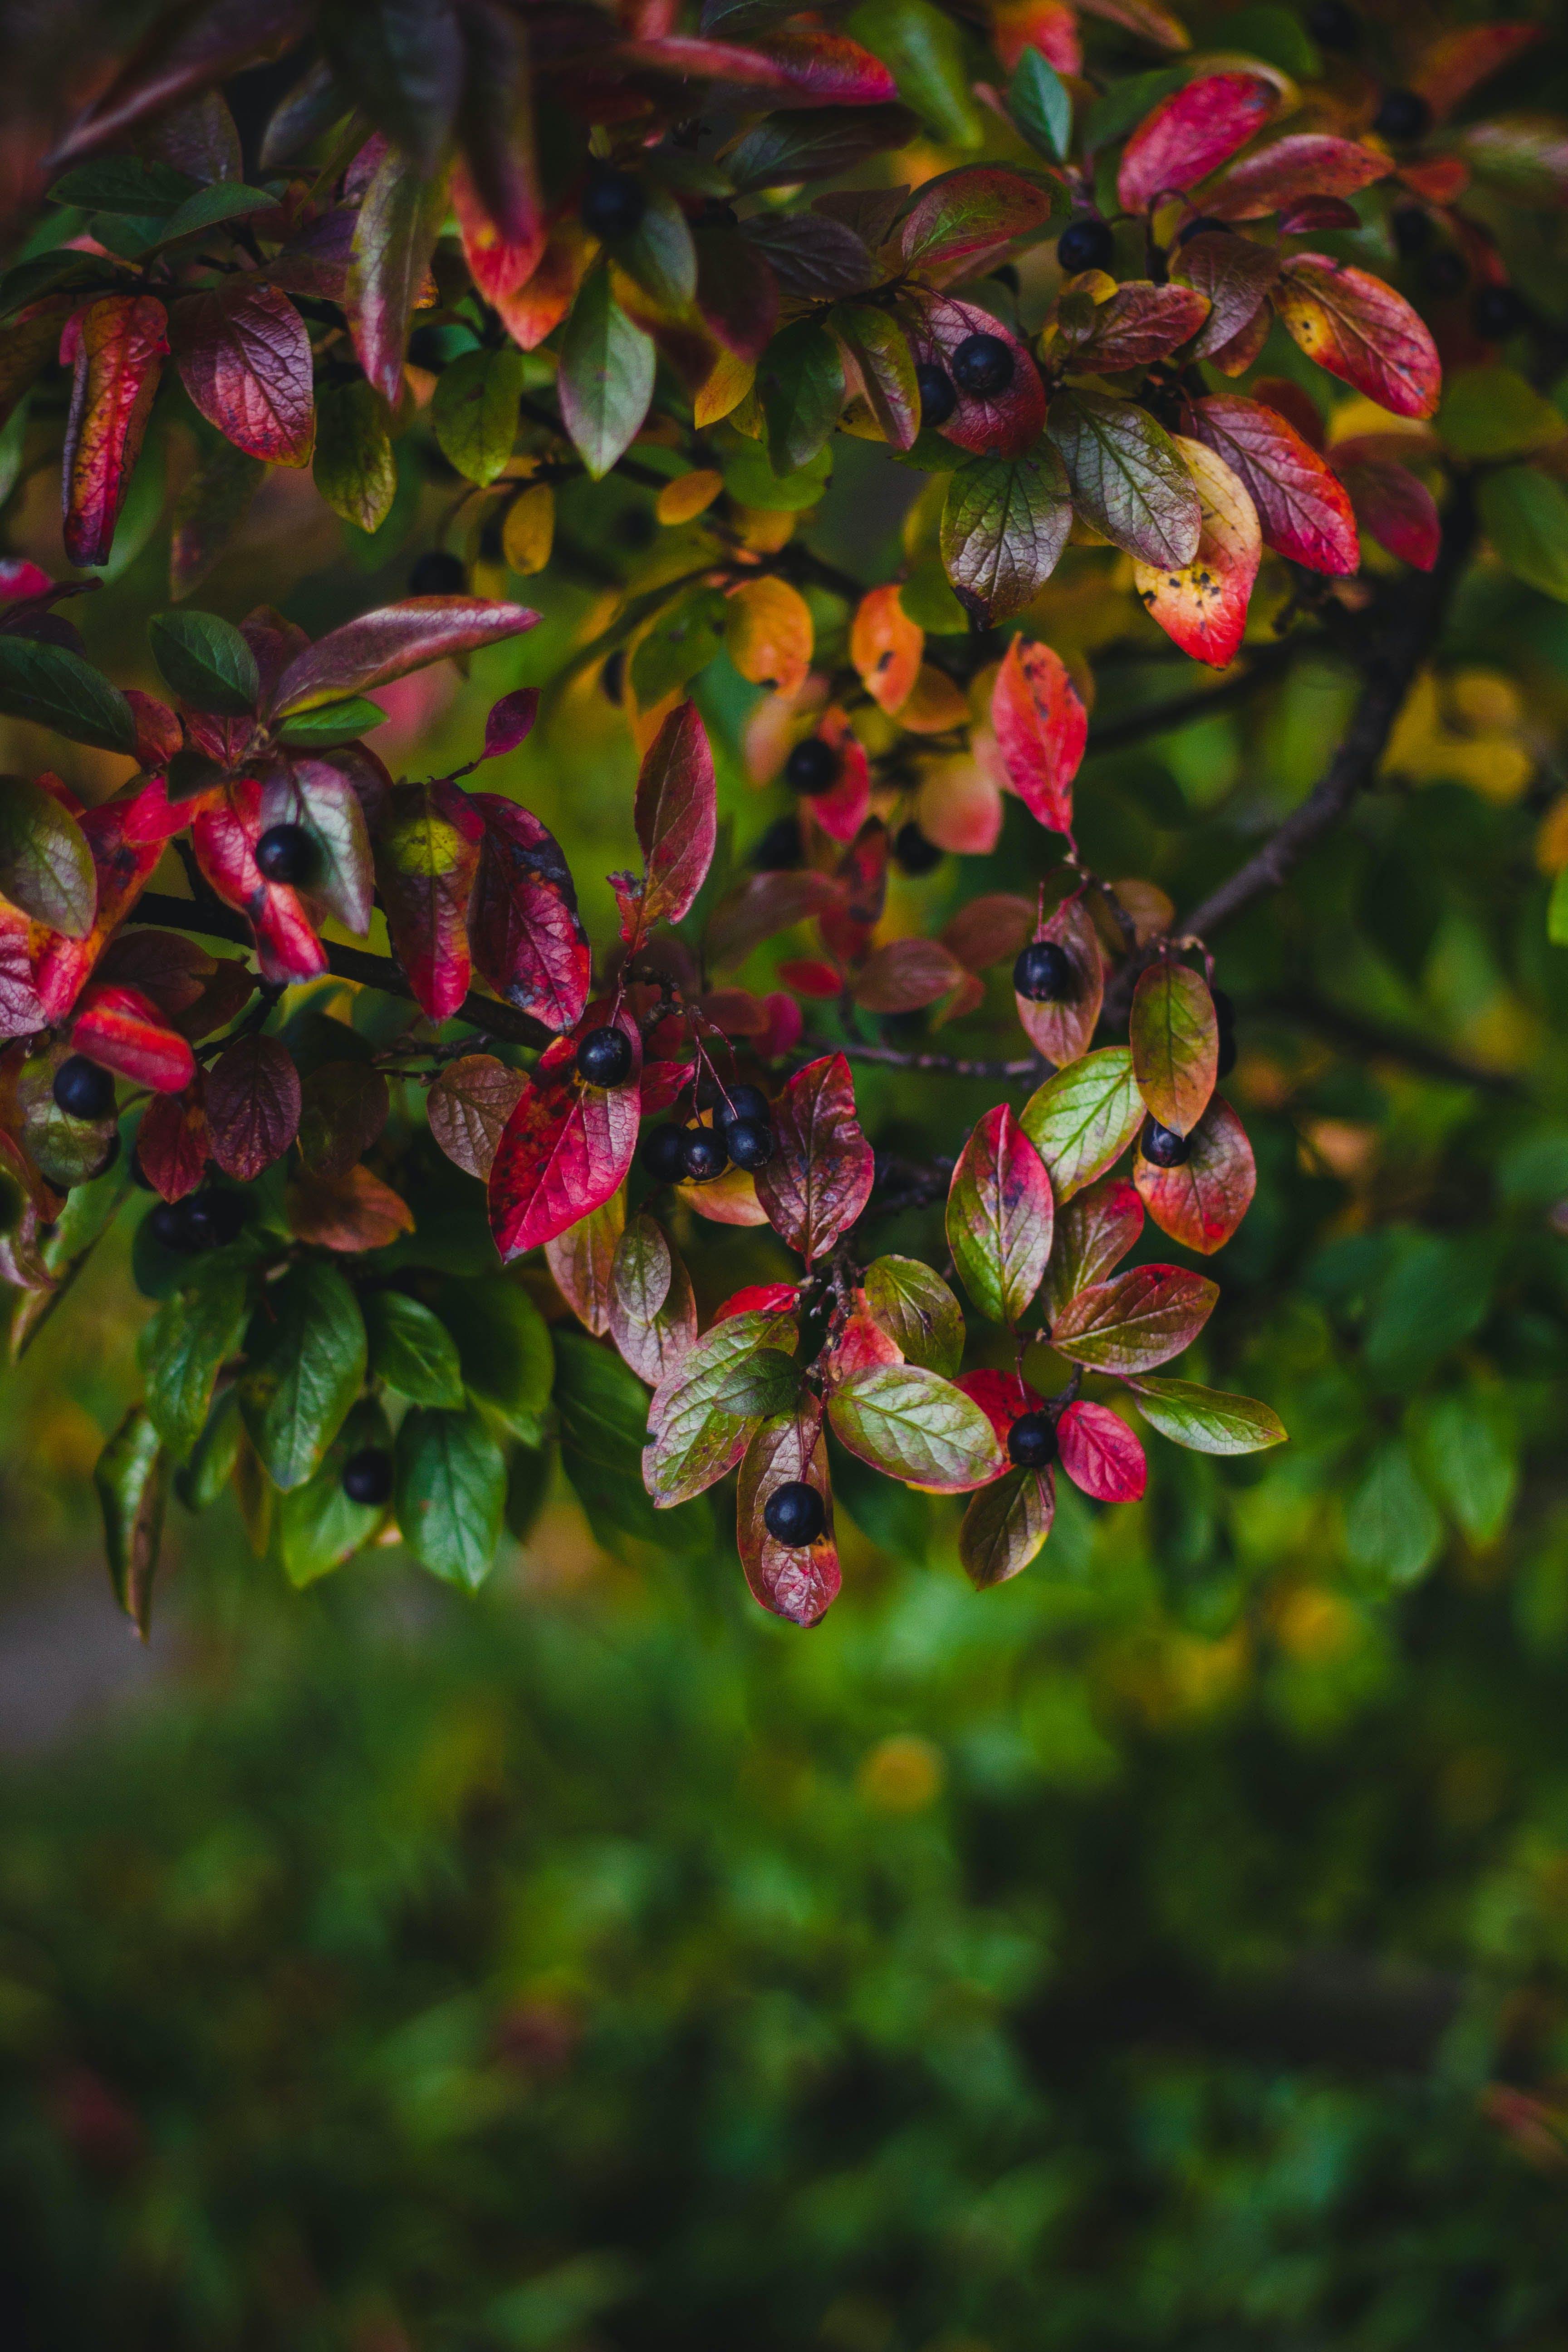 Black Berry Fruits